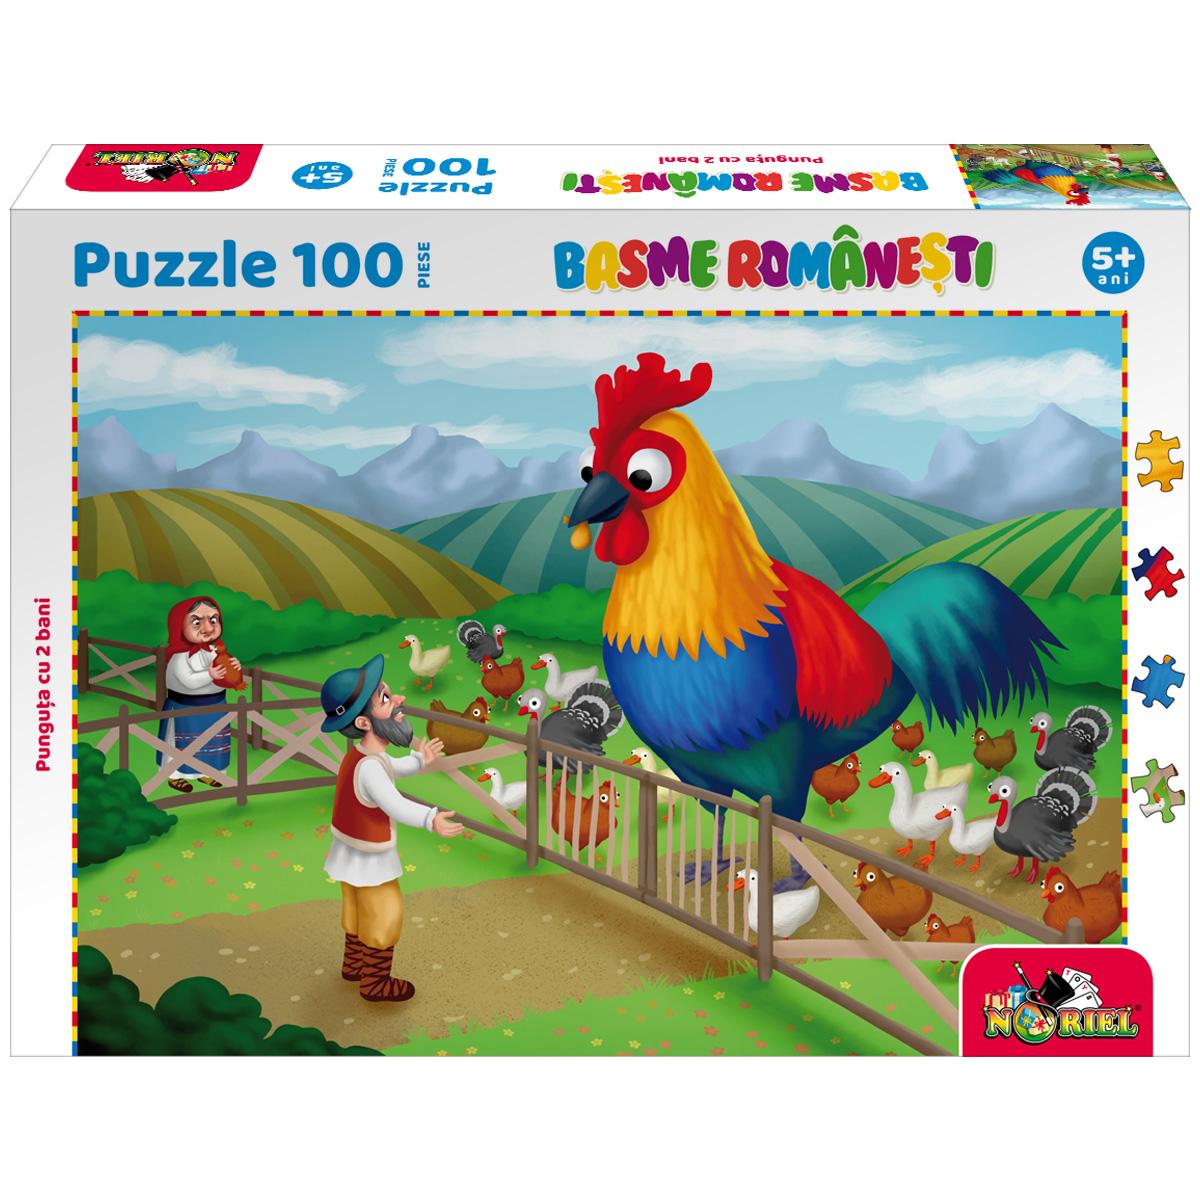 Puzzle 100 piese, Noriel Basme Romanesti, Punguta cu doi bani